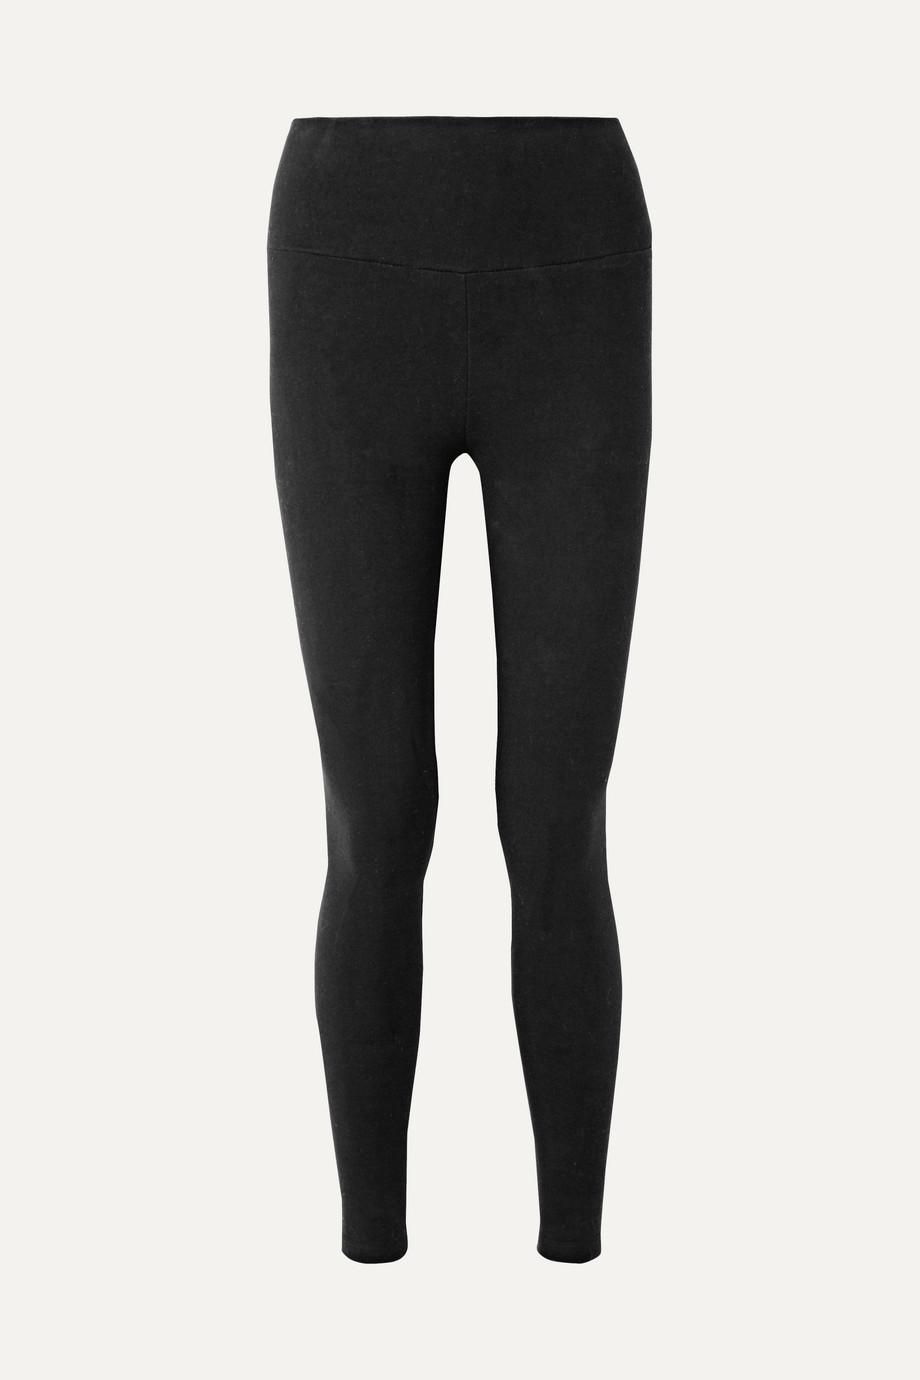 James Perse Fleece leggings